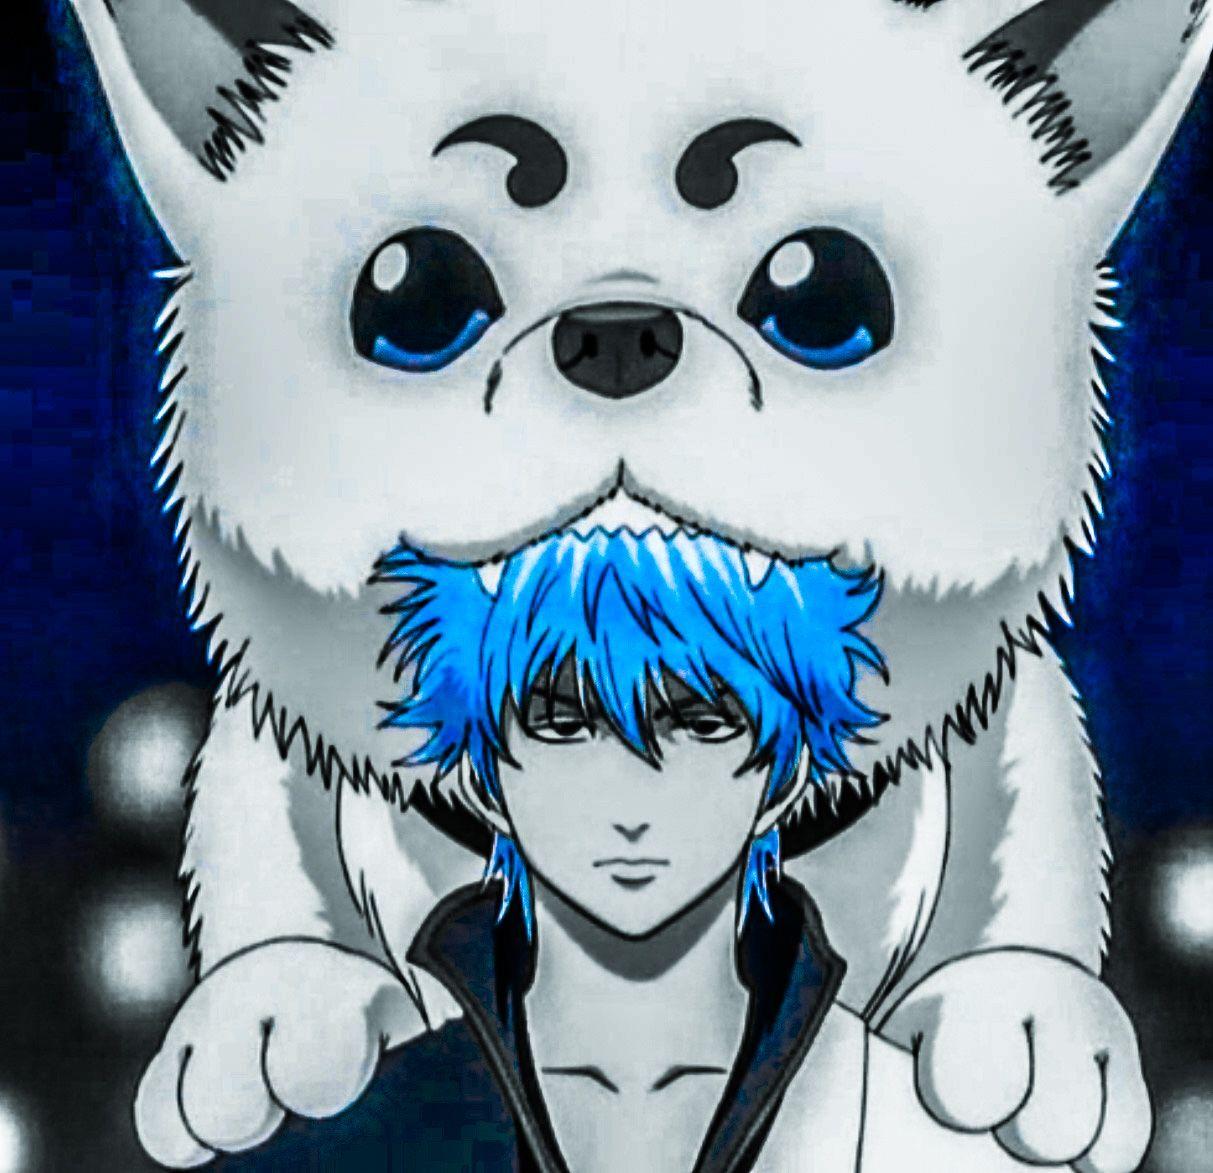 gintamaaveryunderatedshow/ Anime, Anime reviews, Bad